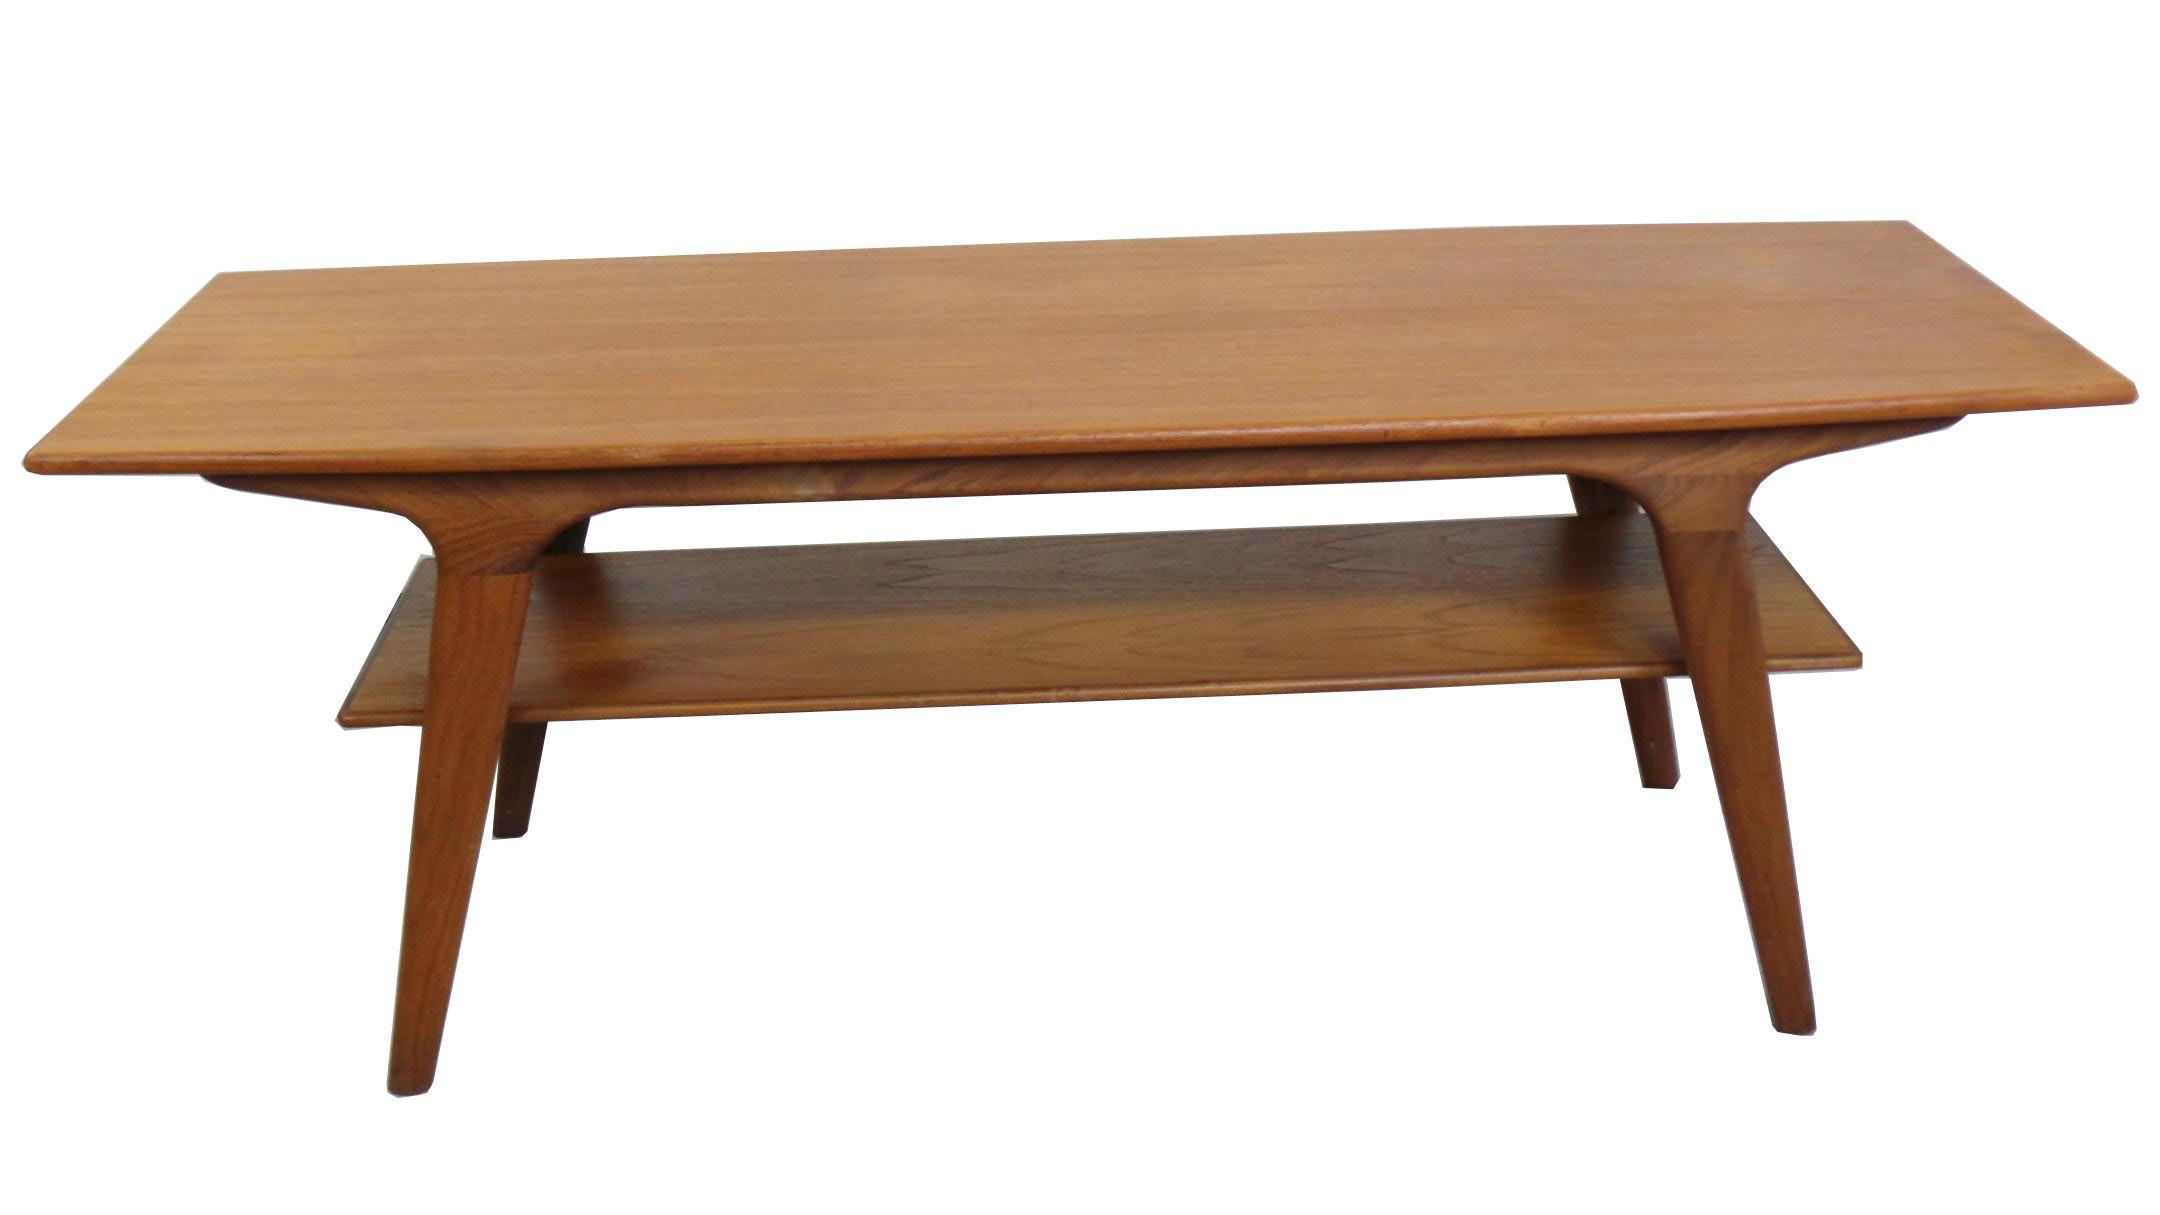 1950 S Danish Modern Teak Coffee Table Modernism Danish Teak Furniture Teak Coffee Table Danish Modern Coffee Table [ 1215 x 2160 Pixel ]